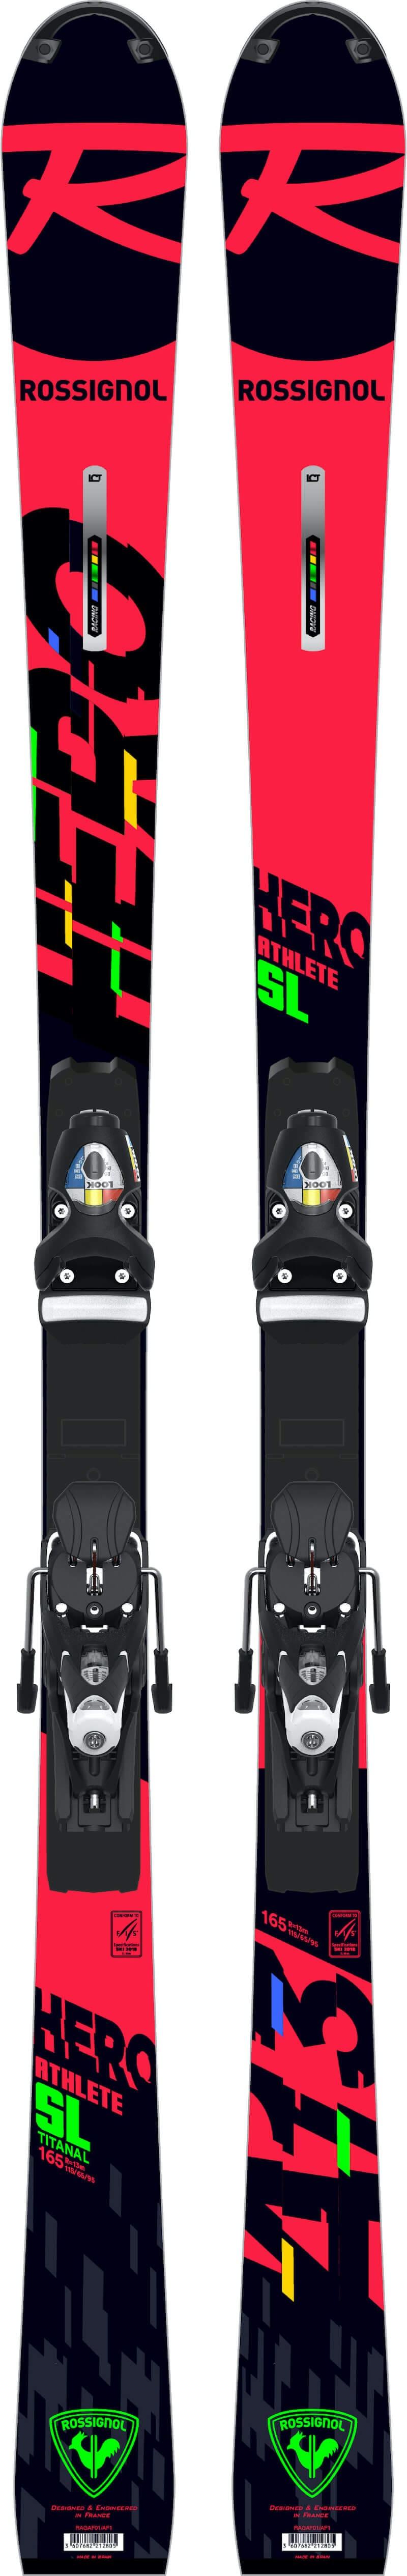 ROSSIGNOL HERO ATHLETE 157 SL R22/SPX15 RKB - 157 cm